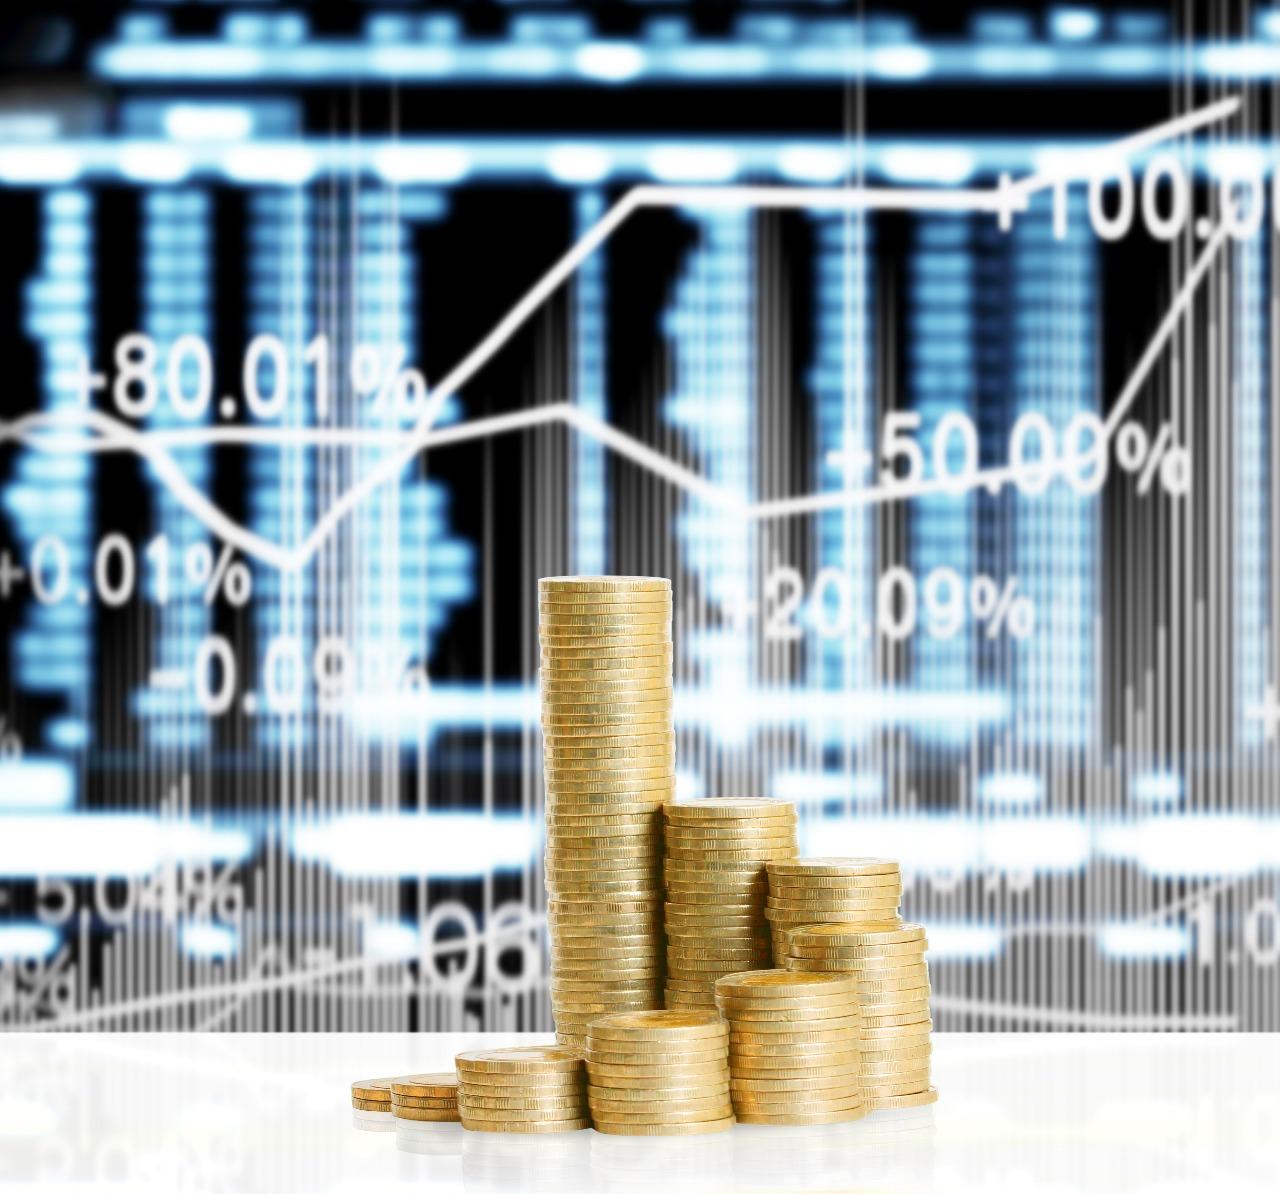 https: img-k.okeinfo.net content 2019 05 13 278 2054945 tumbuh-38-3-pendapatan-estika-tata-tiara-capai-rp278-2-miliar-HRd9Evq9h0.jpg